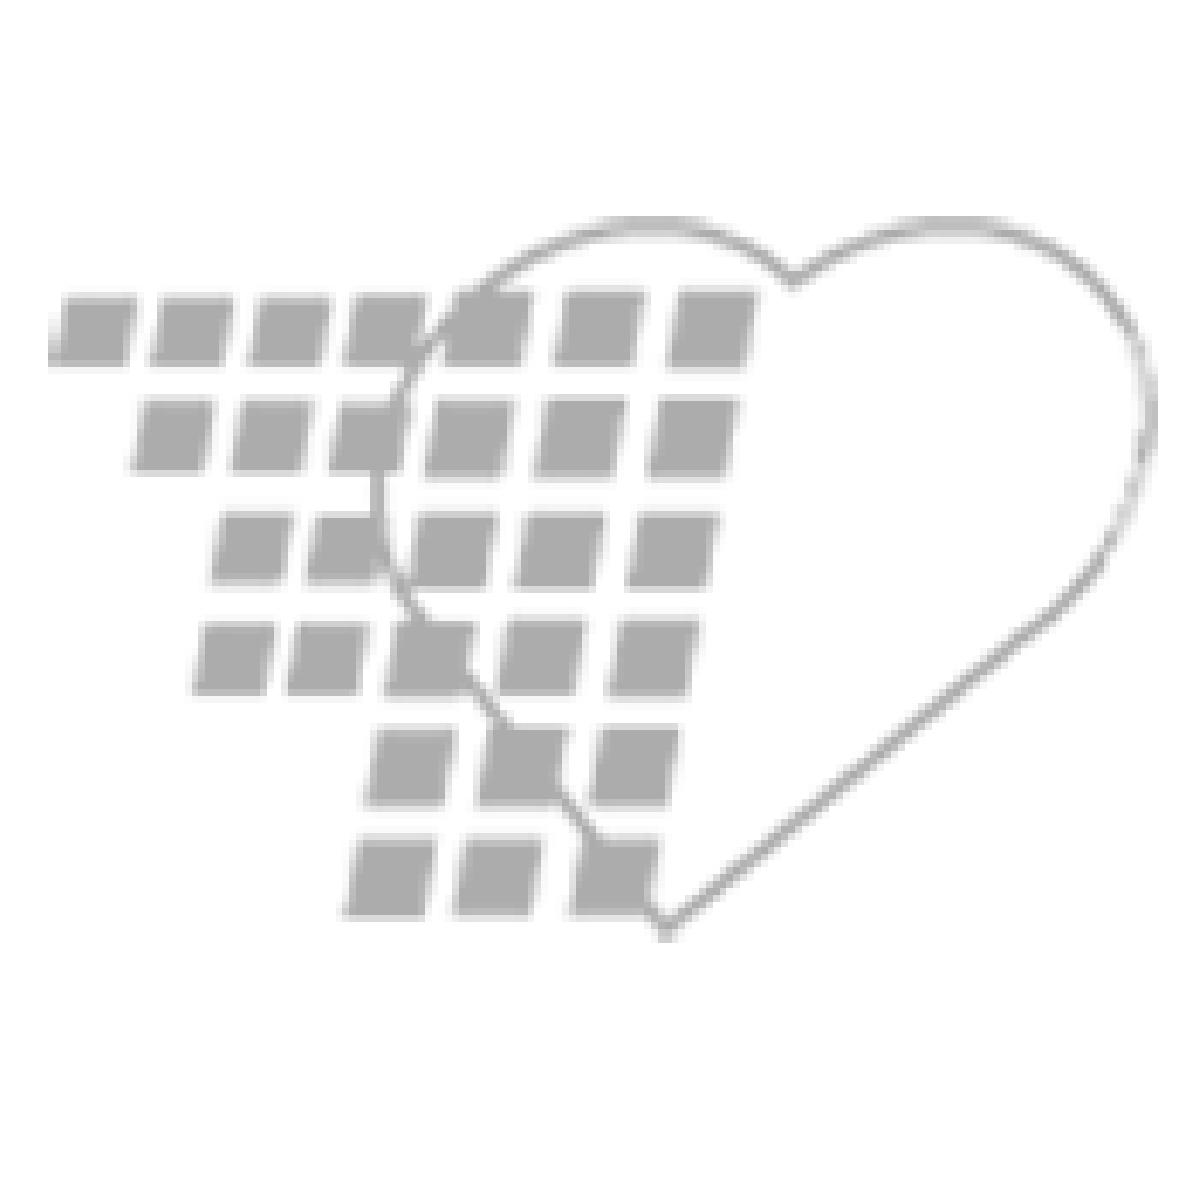 06-93-9029 - Demo Dose® Phenyton (Dilantn) 100 mg - 100/Bottle